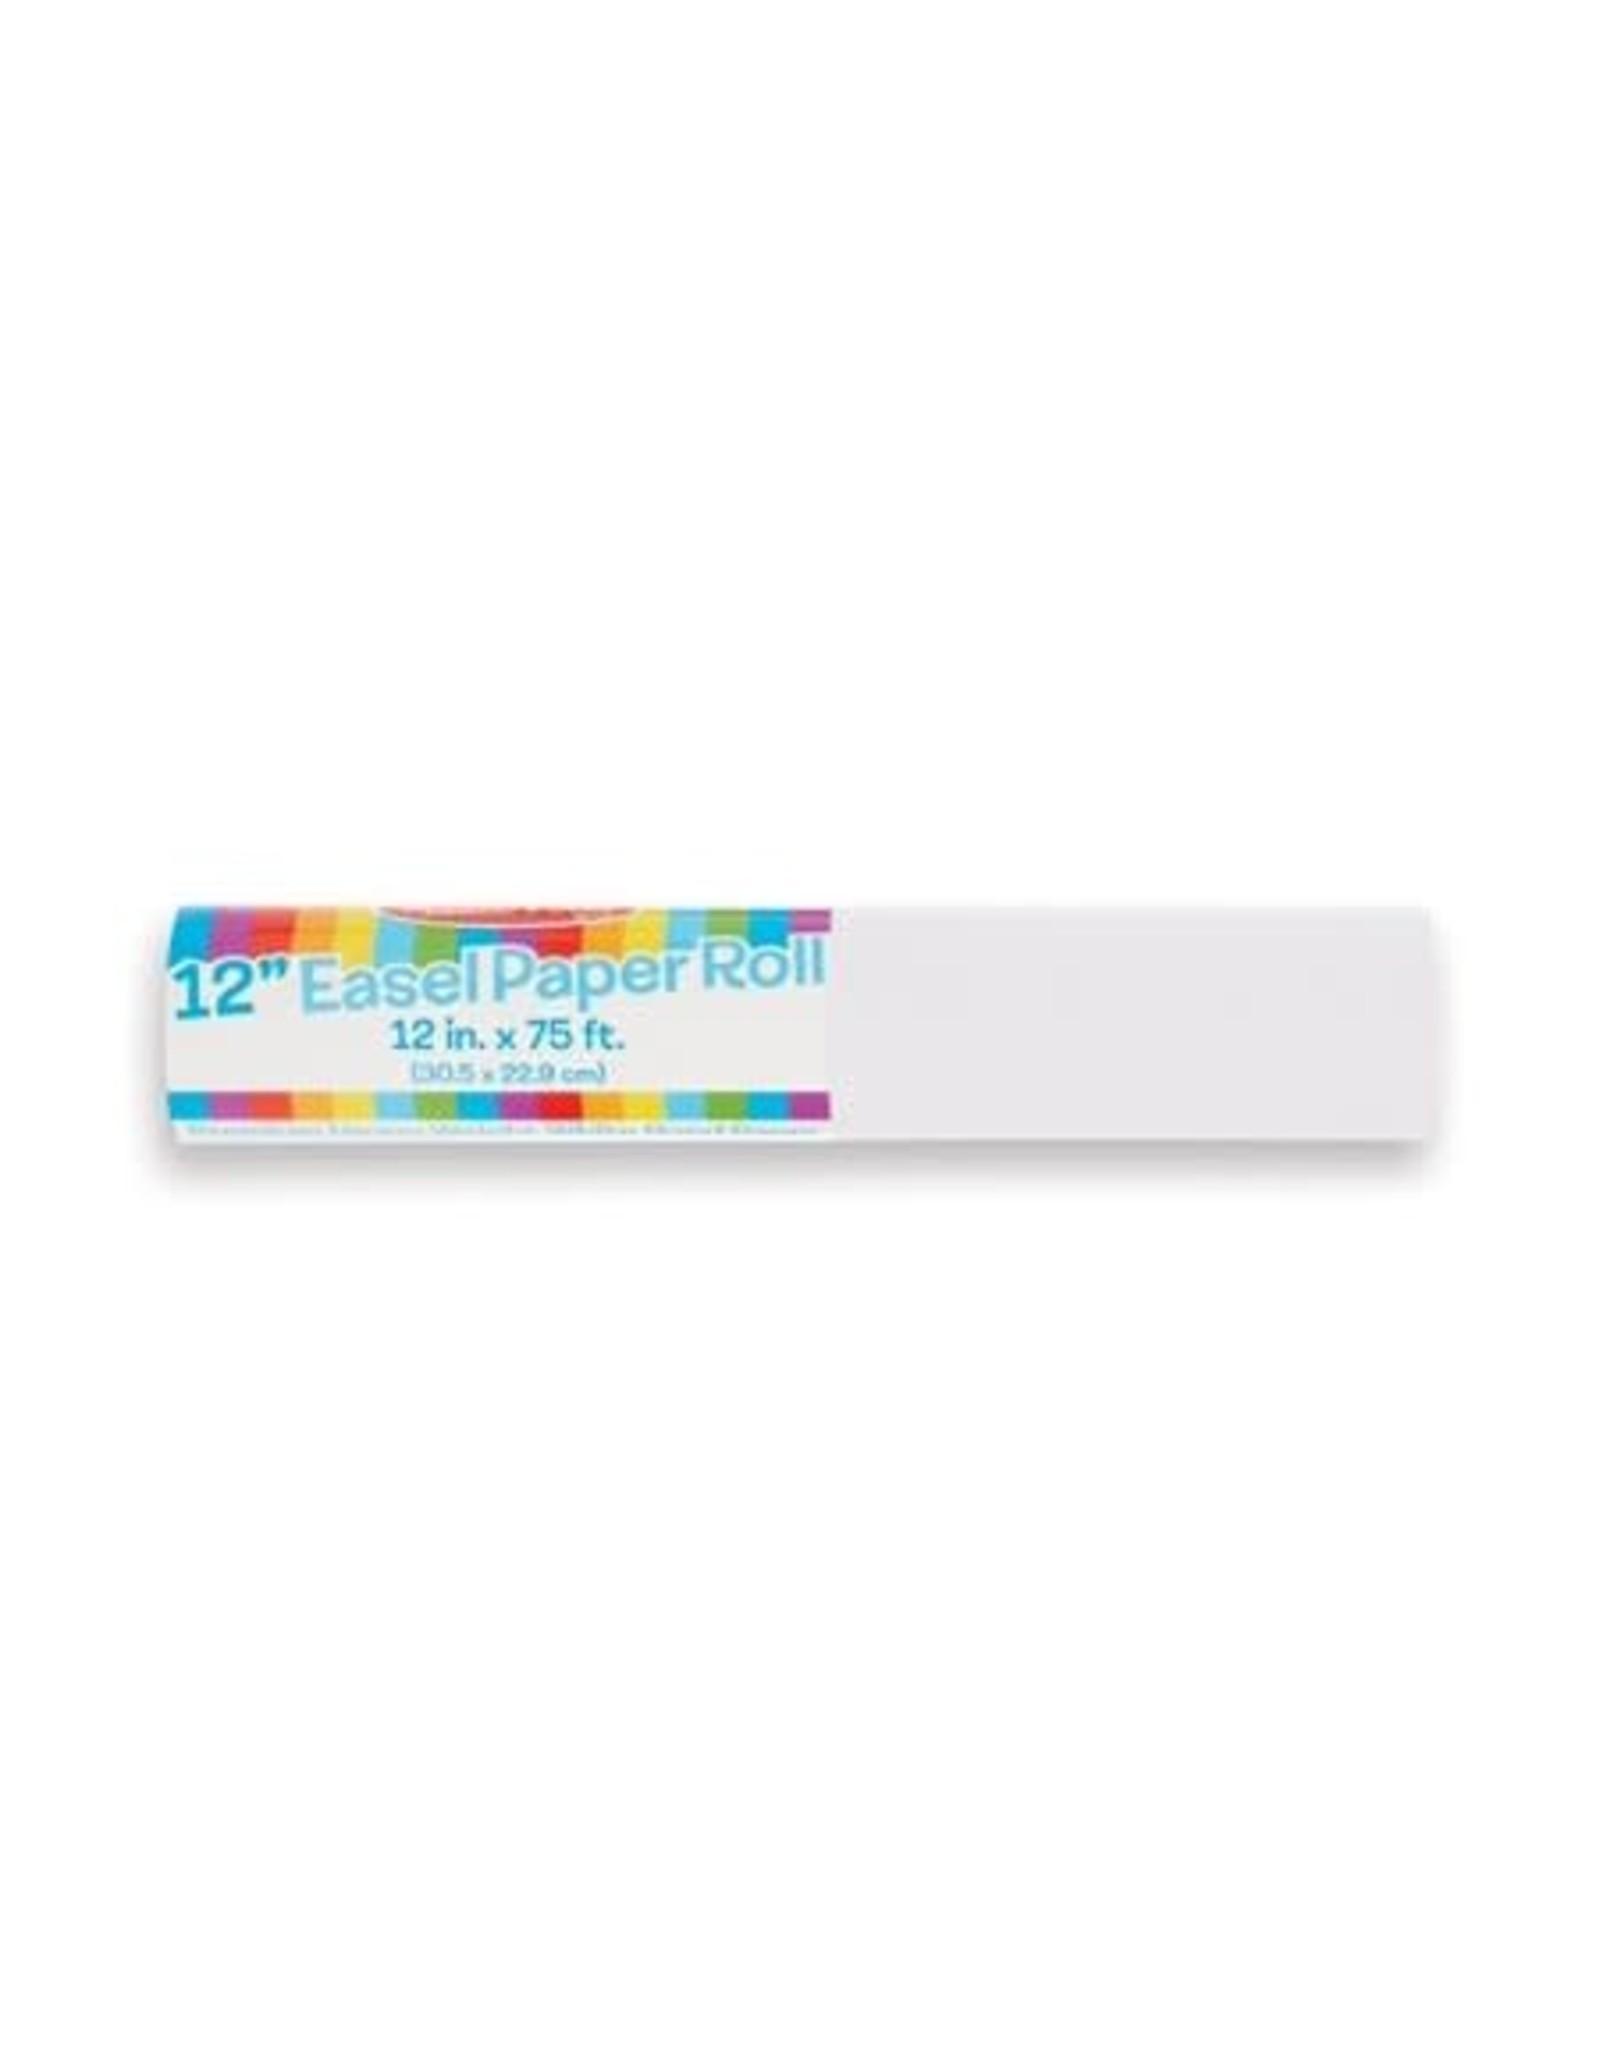 "Melissa & Doug Easel Paper Roll - Small 12"""